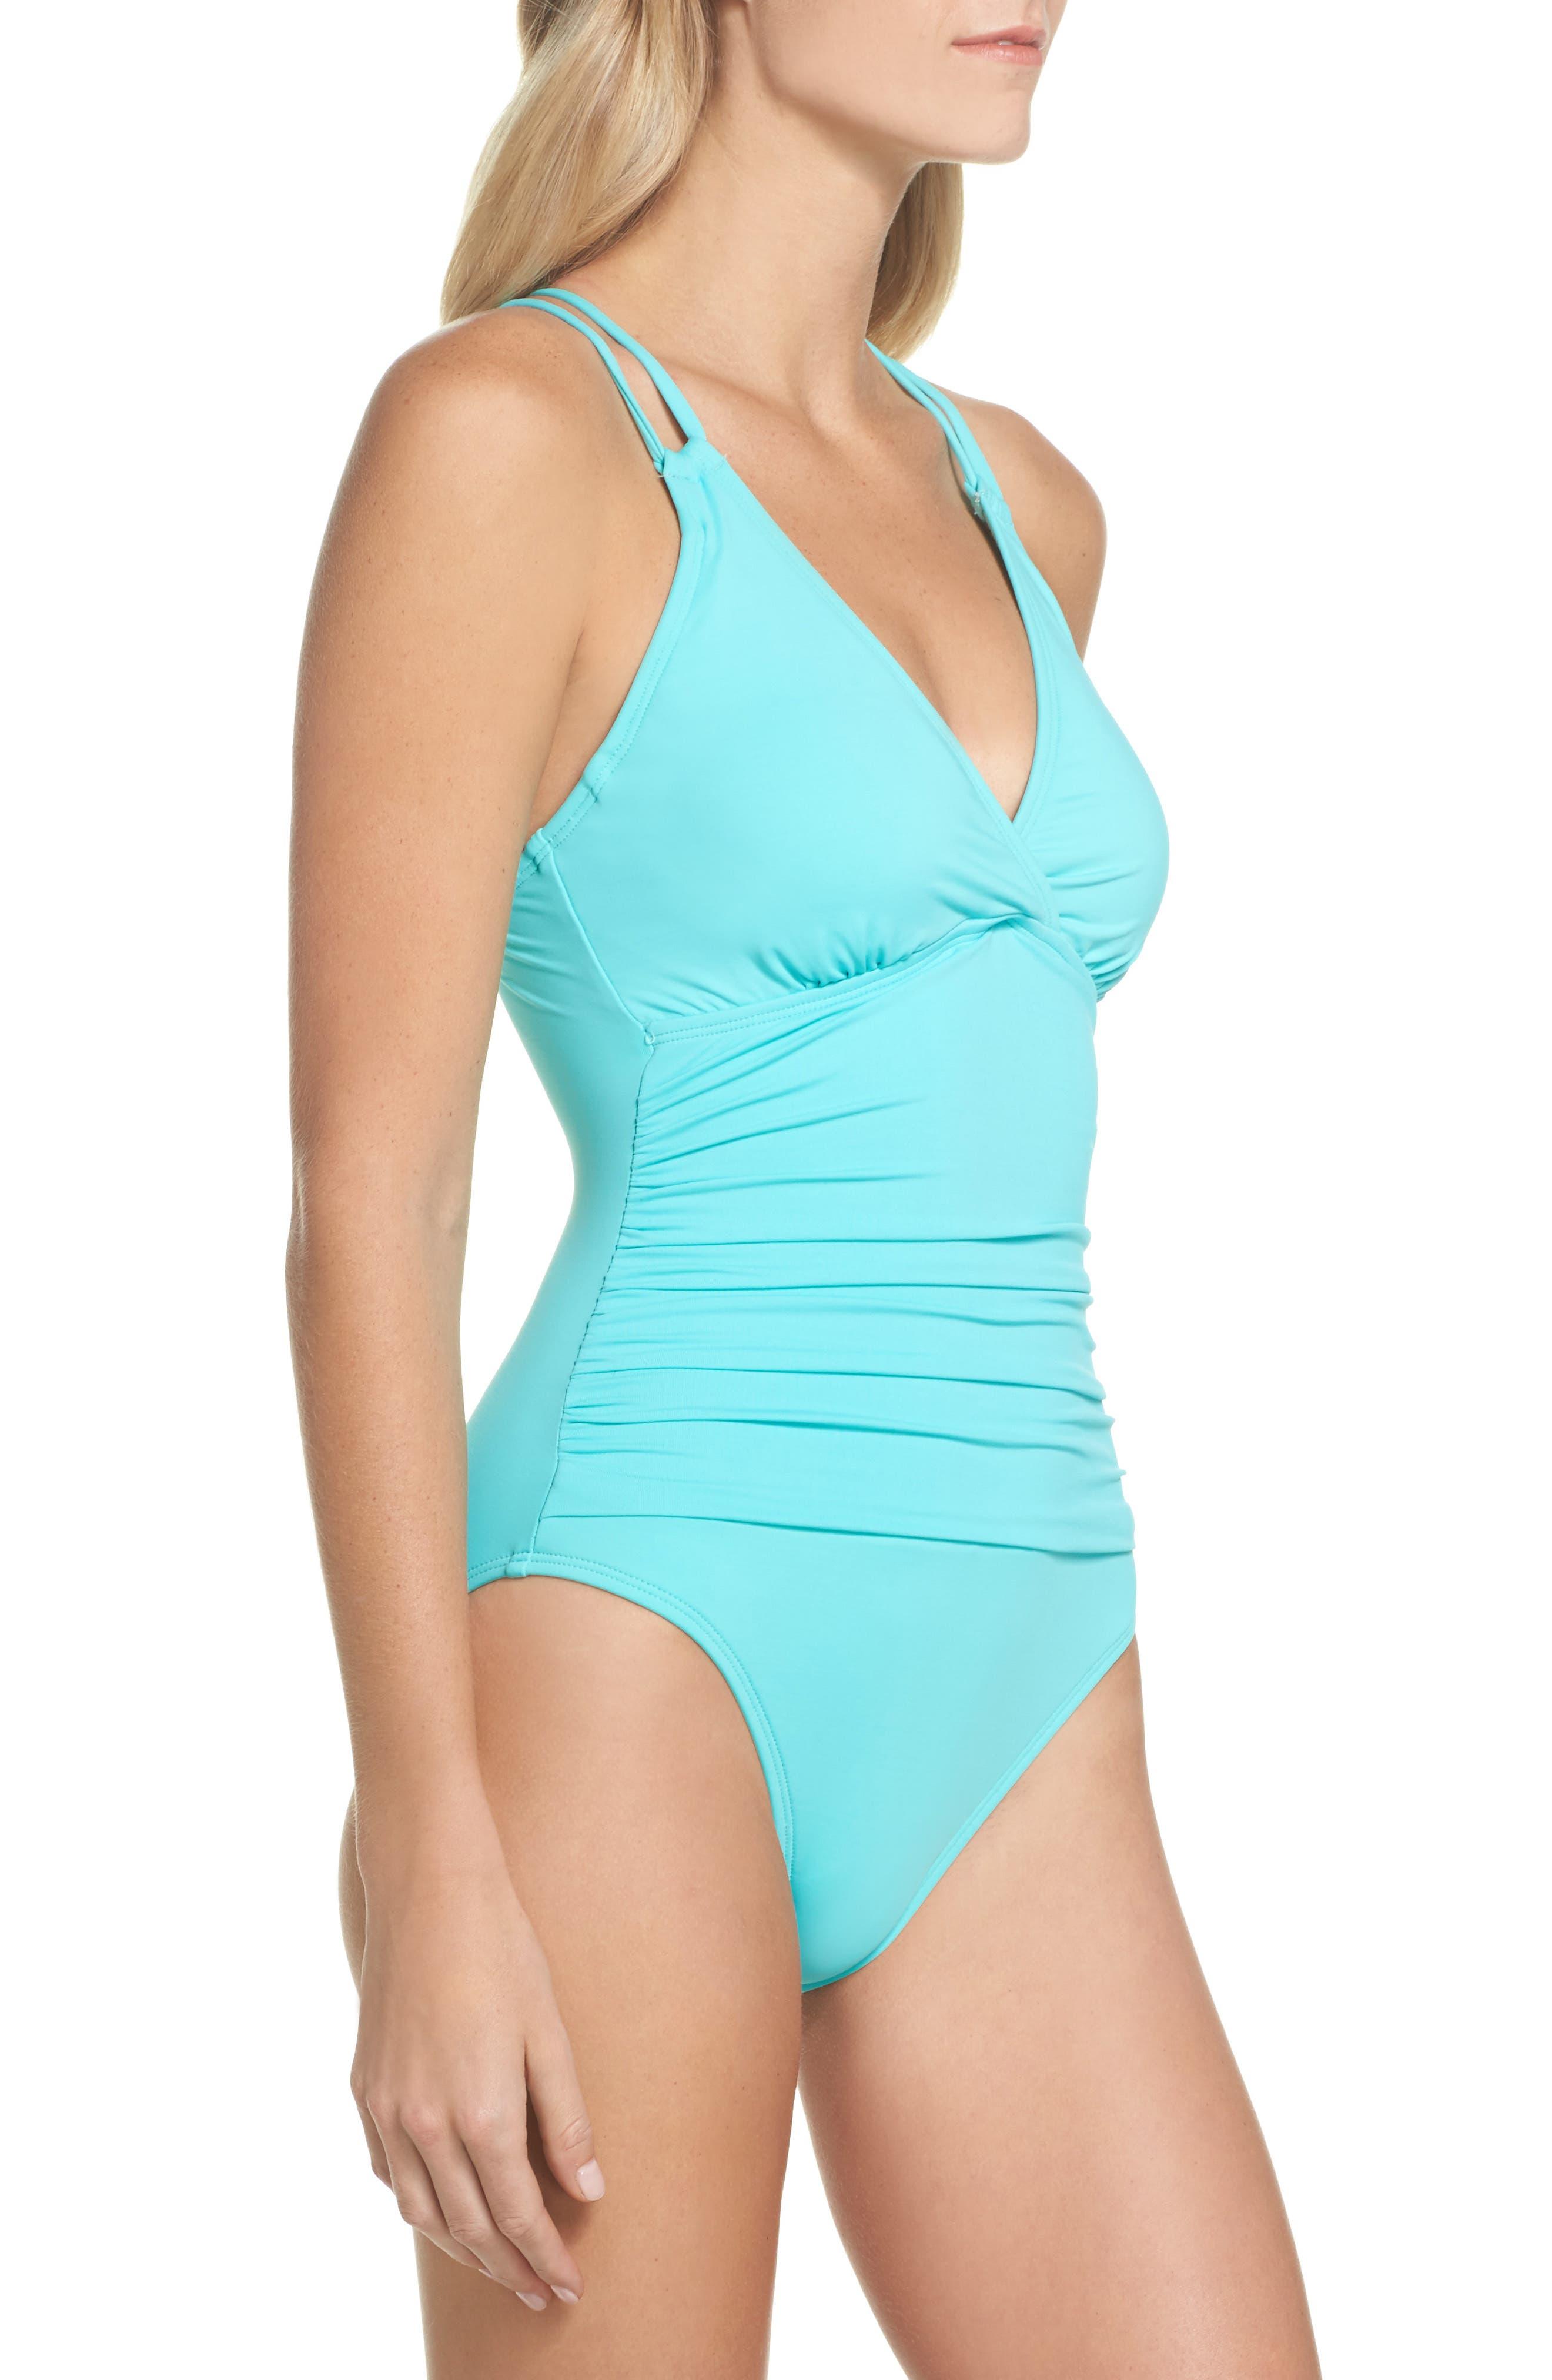 Island One-Piece Swimsuit,                             Alternate thumbnail 3, color,                             Seafoam